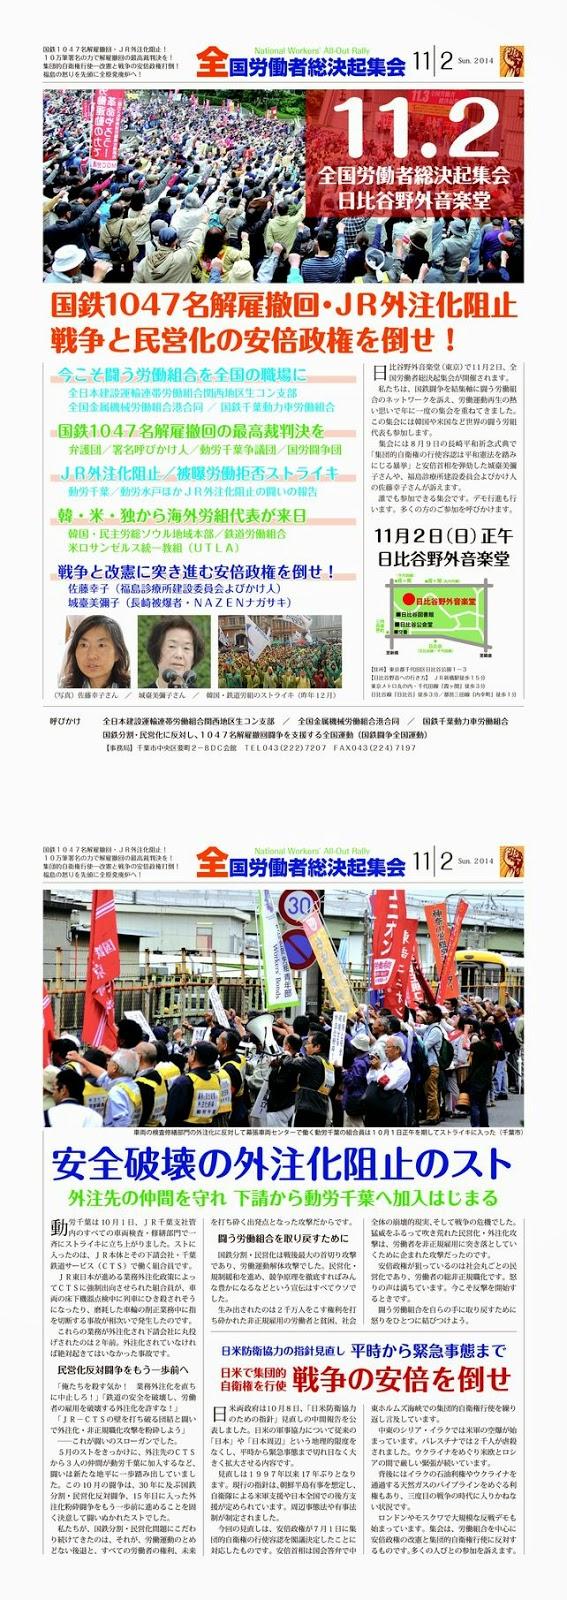 http://www.geocities.jp/nov_rally/2014/112l2.pdf